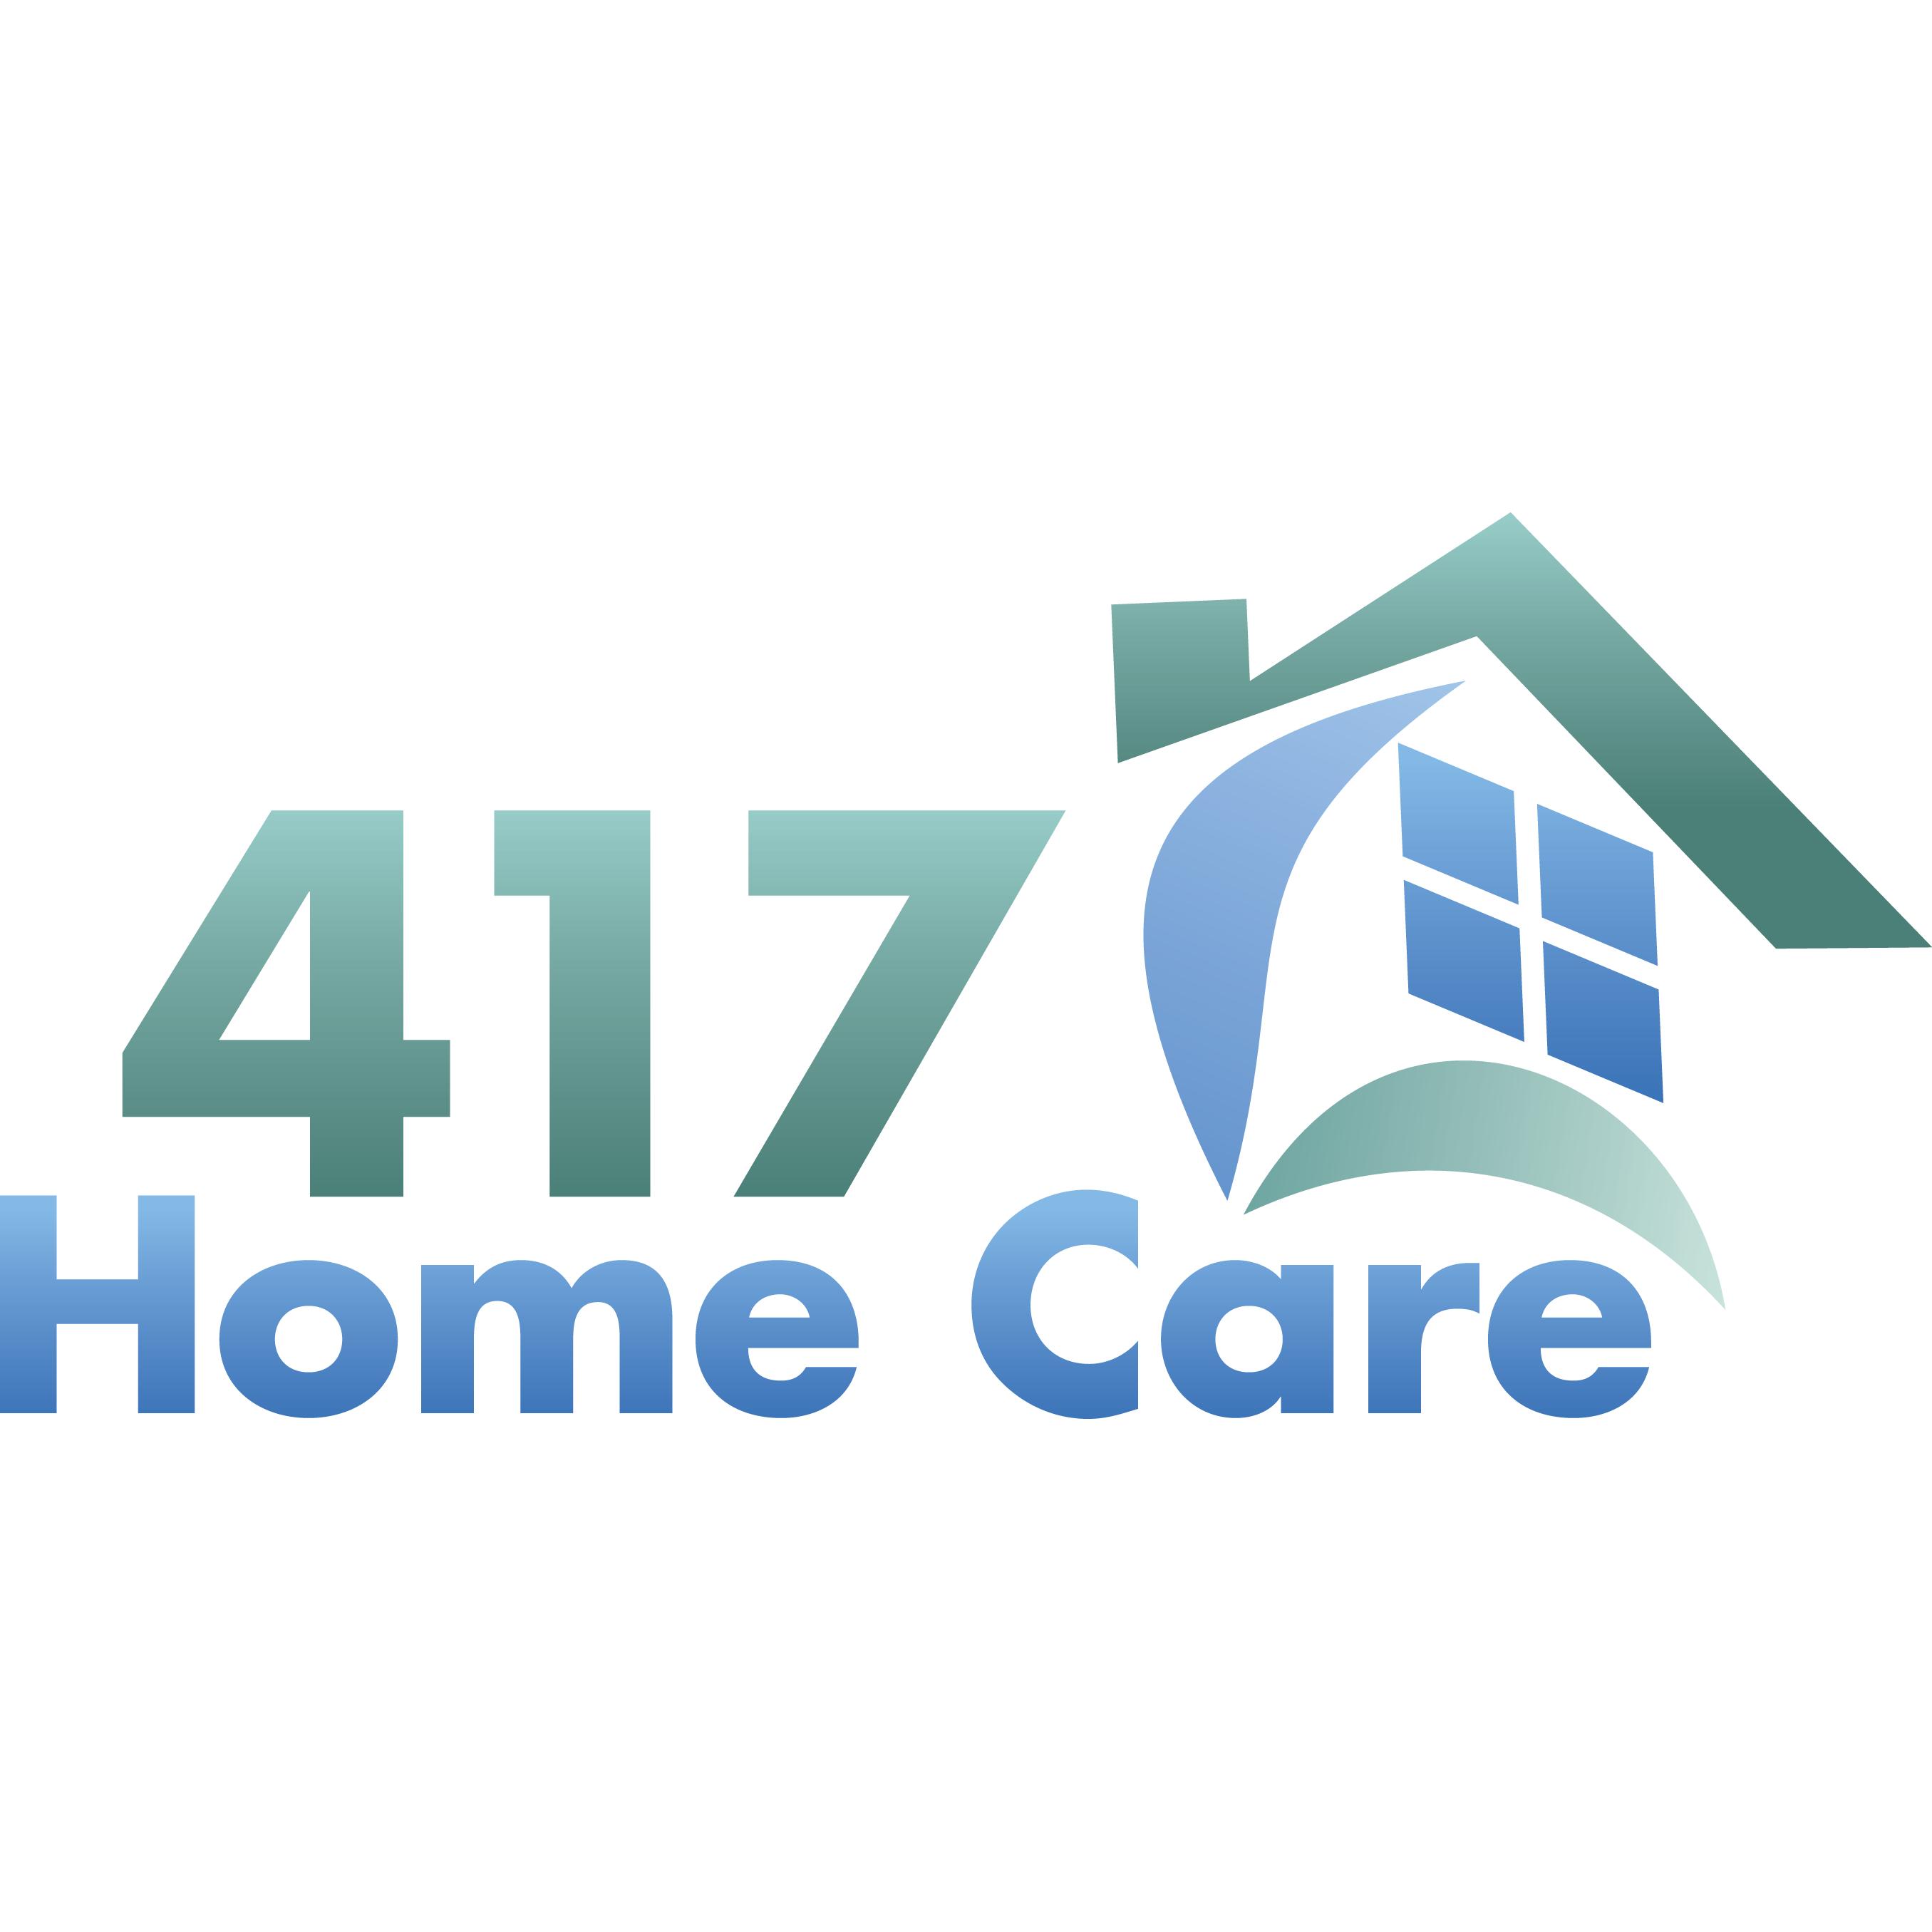 417 Home Care